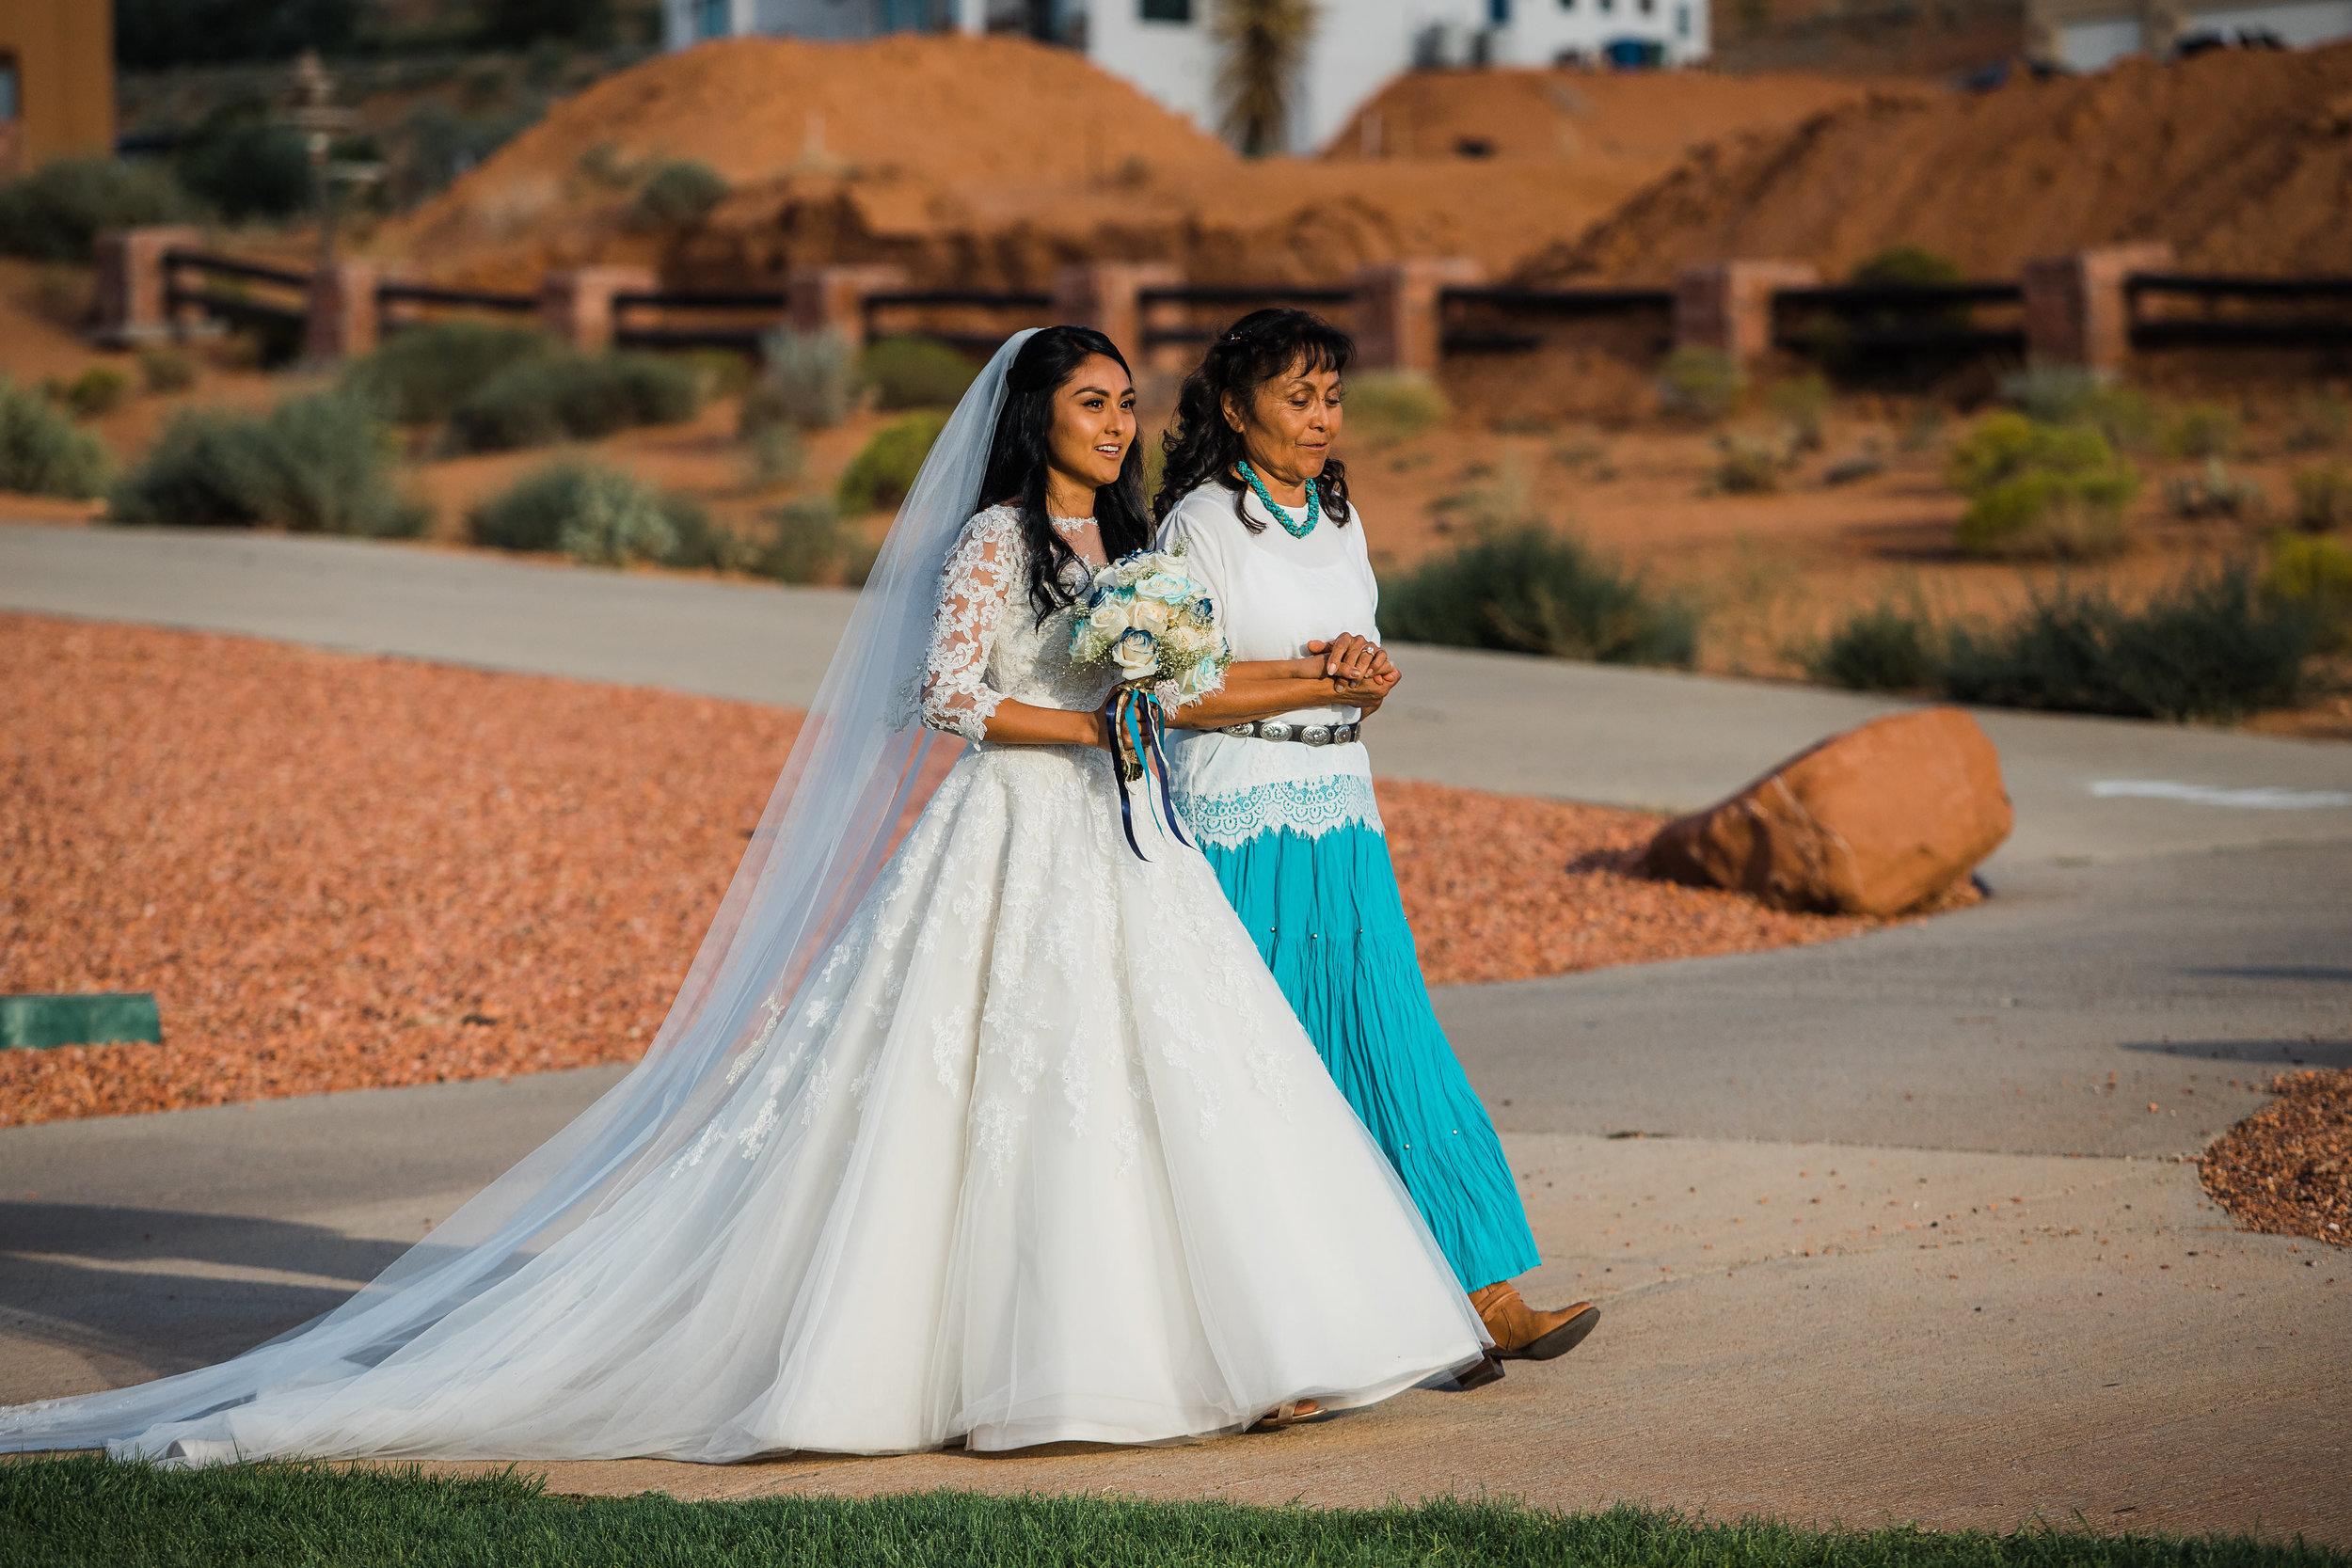 Bride Mother Walking Ceremony